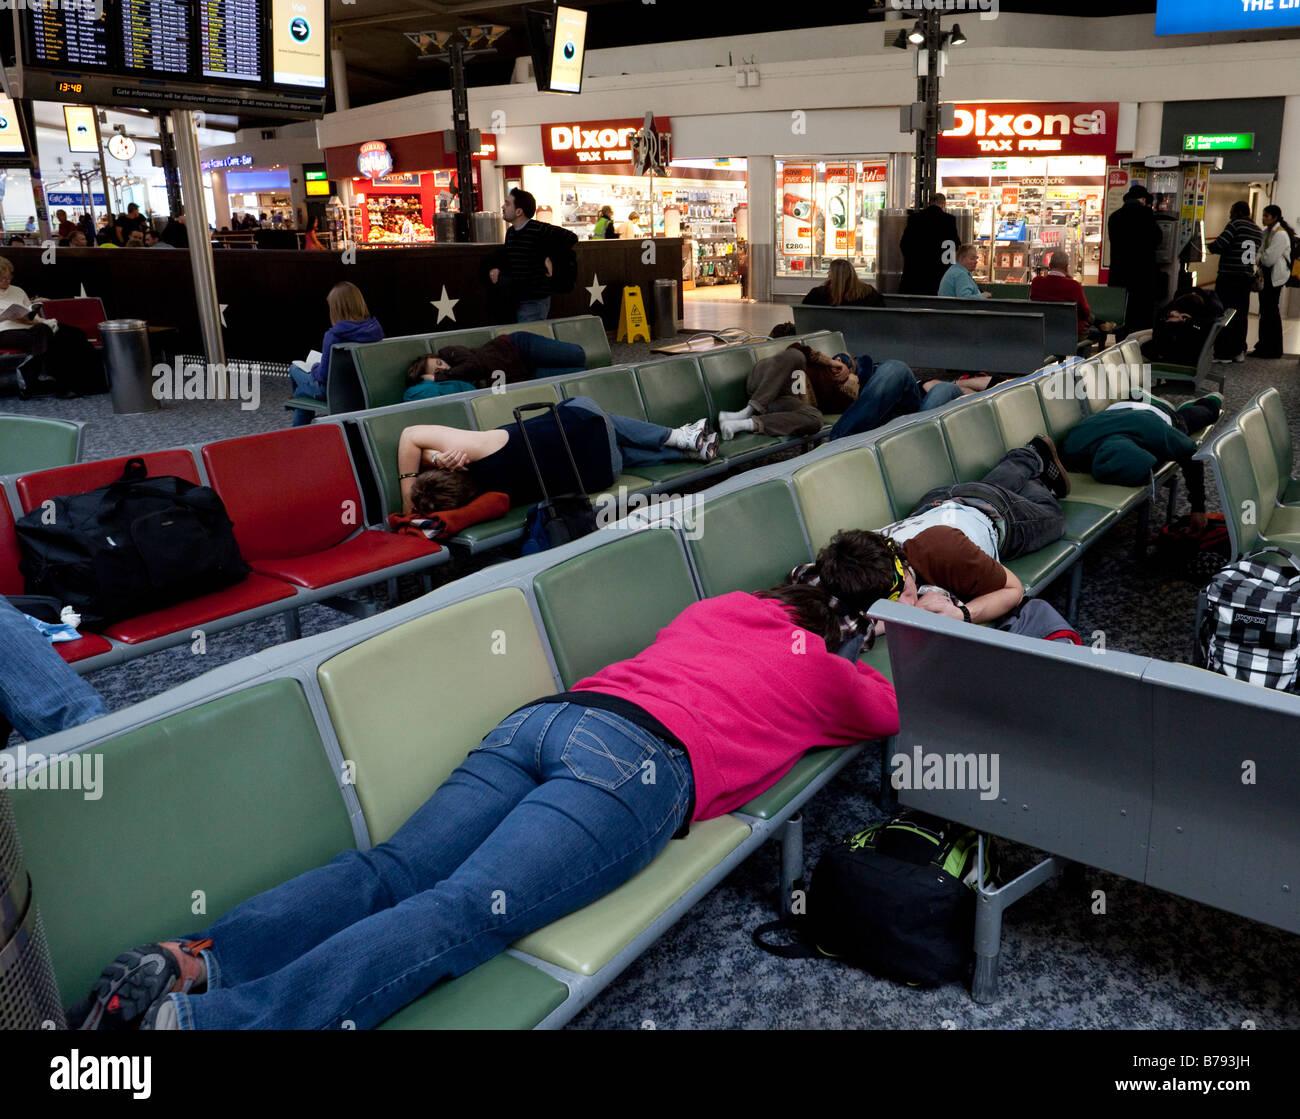 passengers waiting to board flights, Terminal 1 departure lounge, Heathrow, London, England - Stock Image